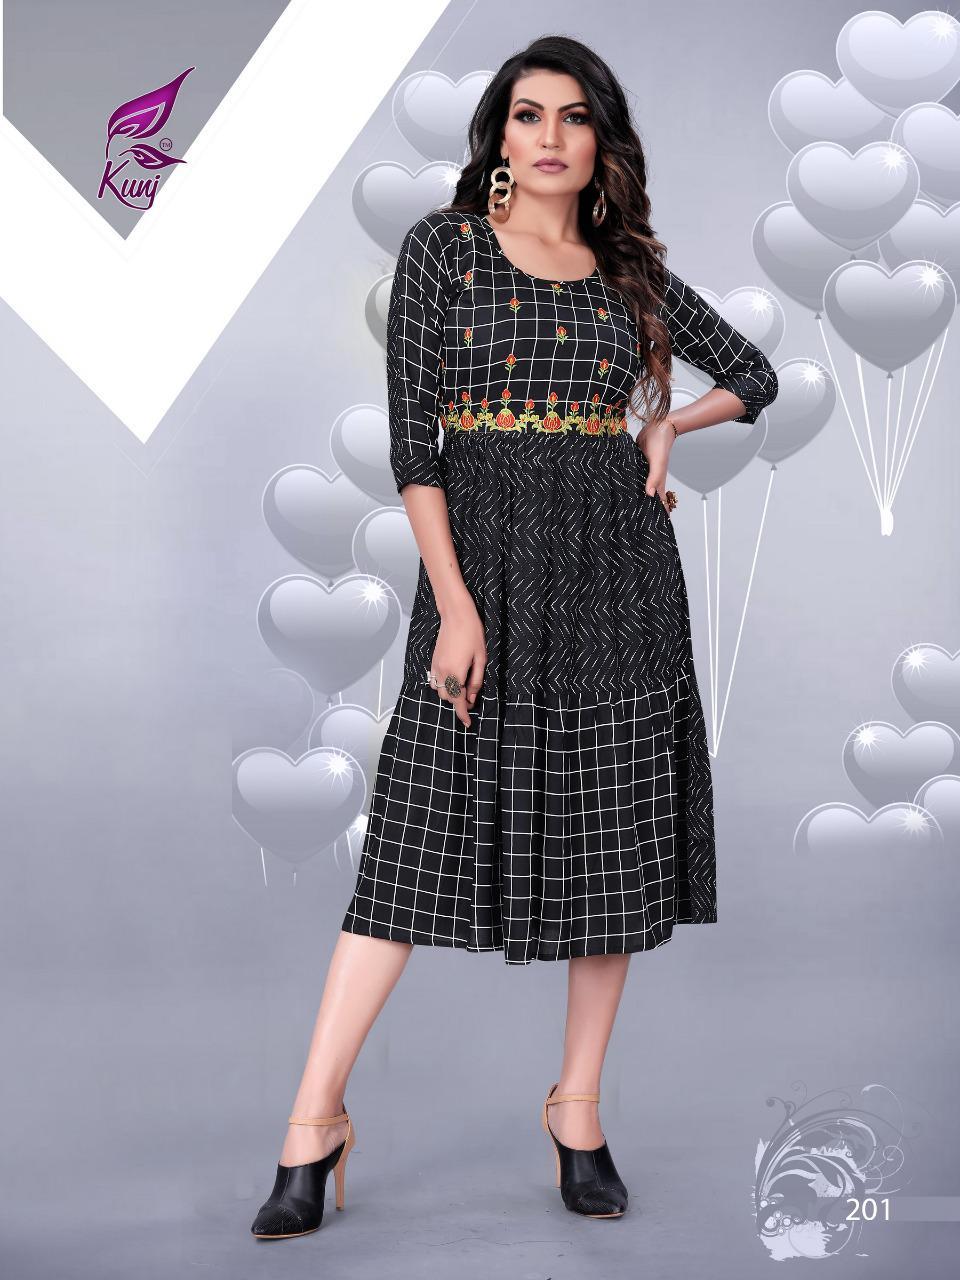 Kivi Vol 2 By Kunj Rayon Printed Short Gown Kurti Collection